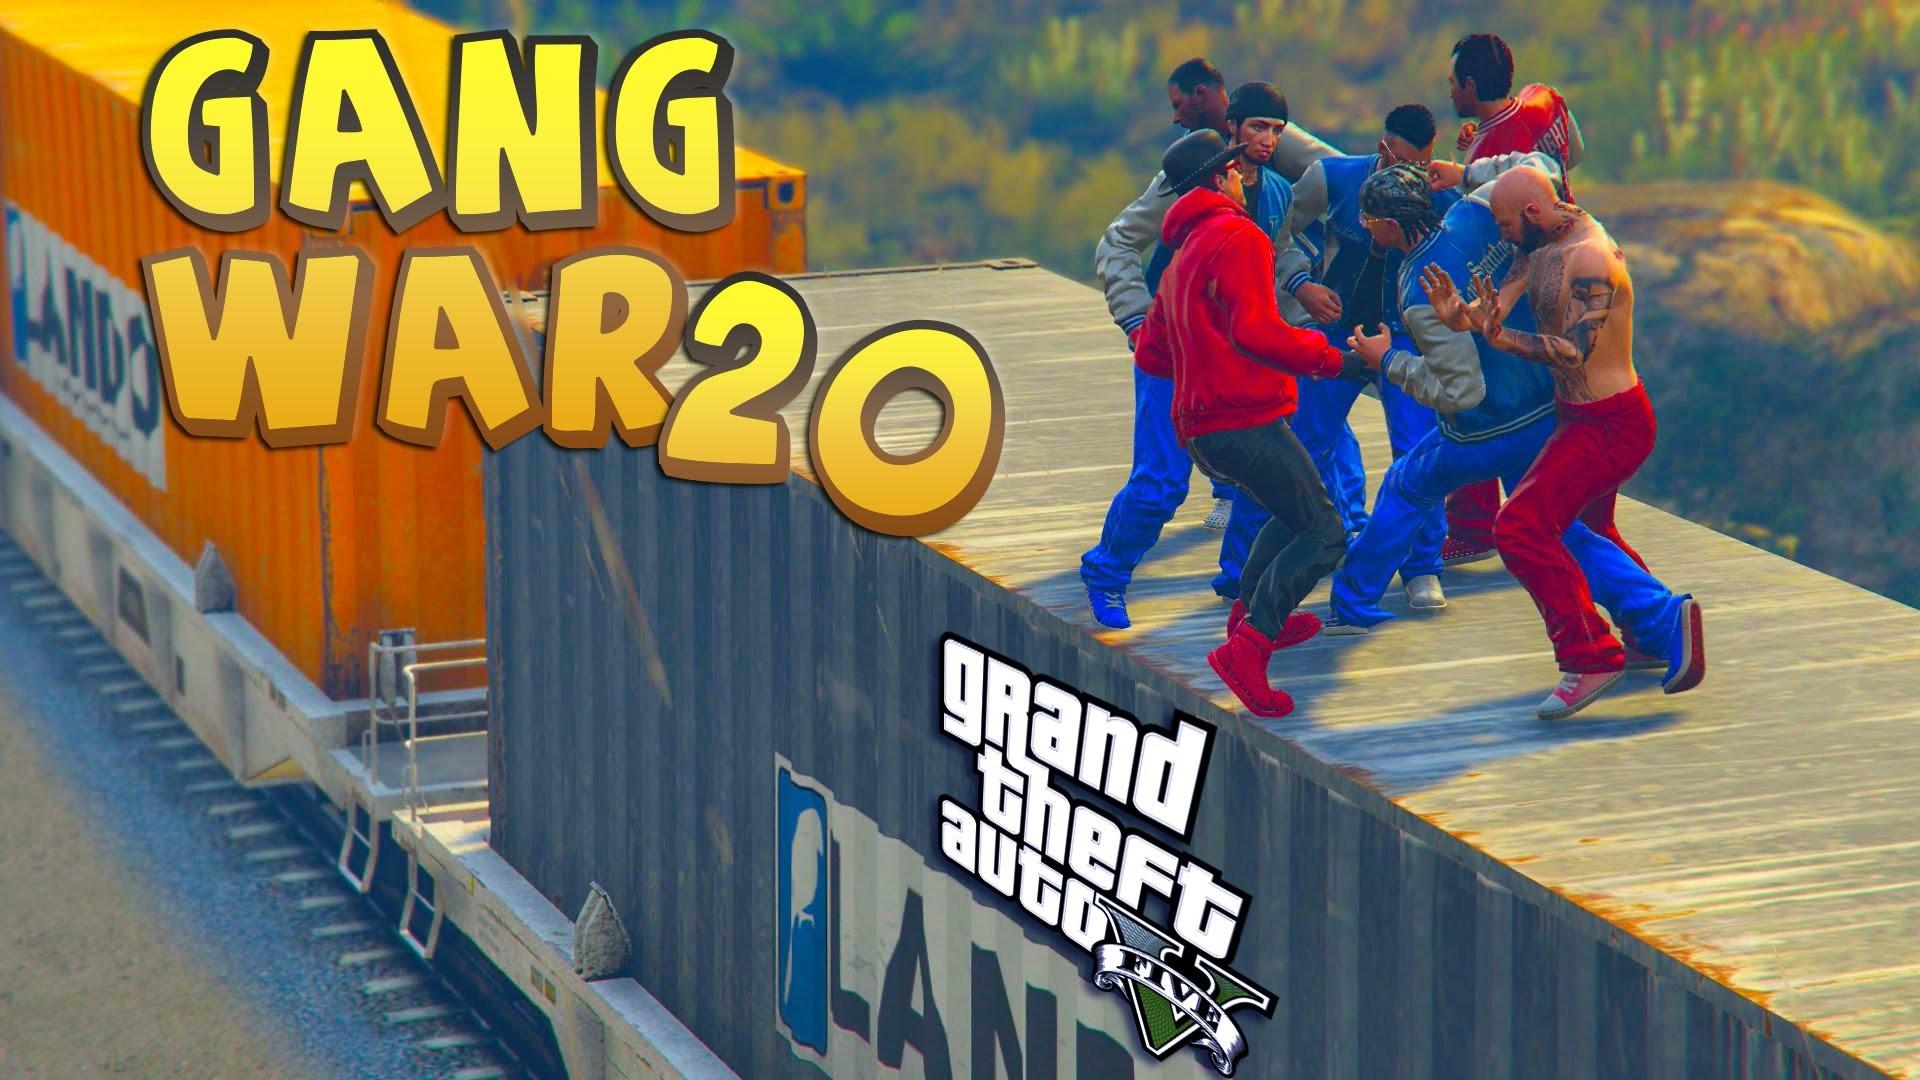 GTA 5 THUG LIFE #20 – GANG WAR BLOOD VS CRIPS SEASON FINALE | S2 – YouTube